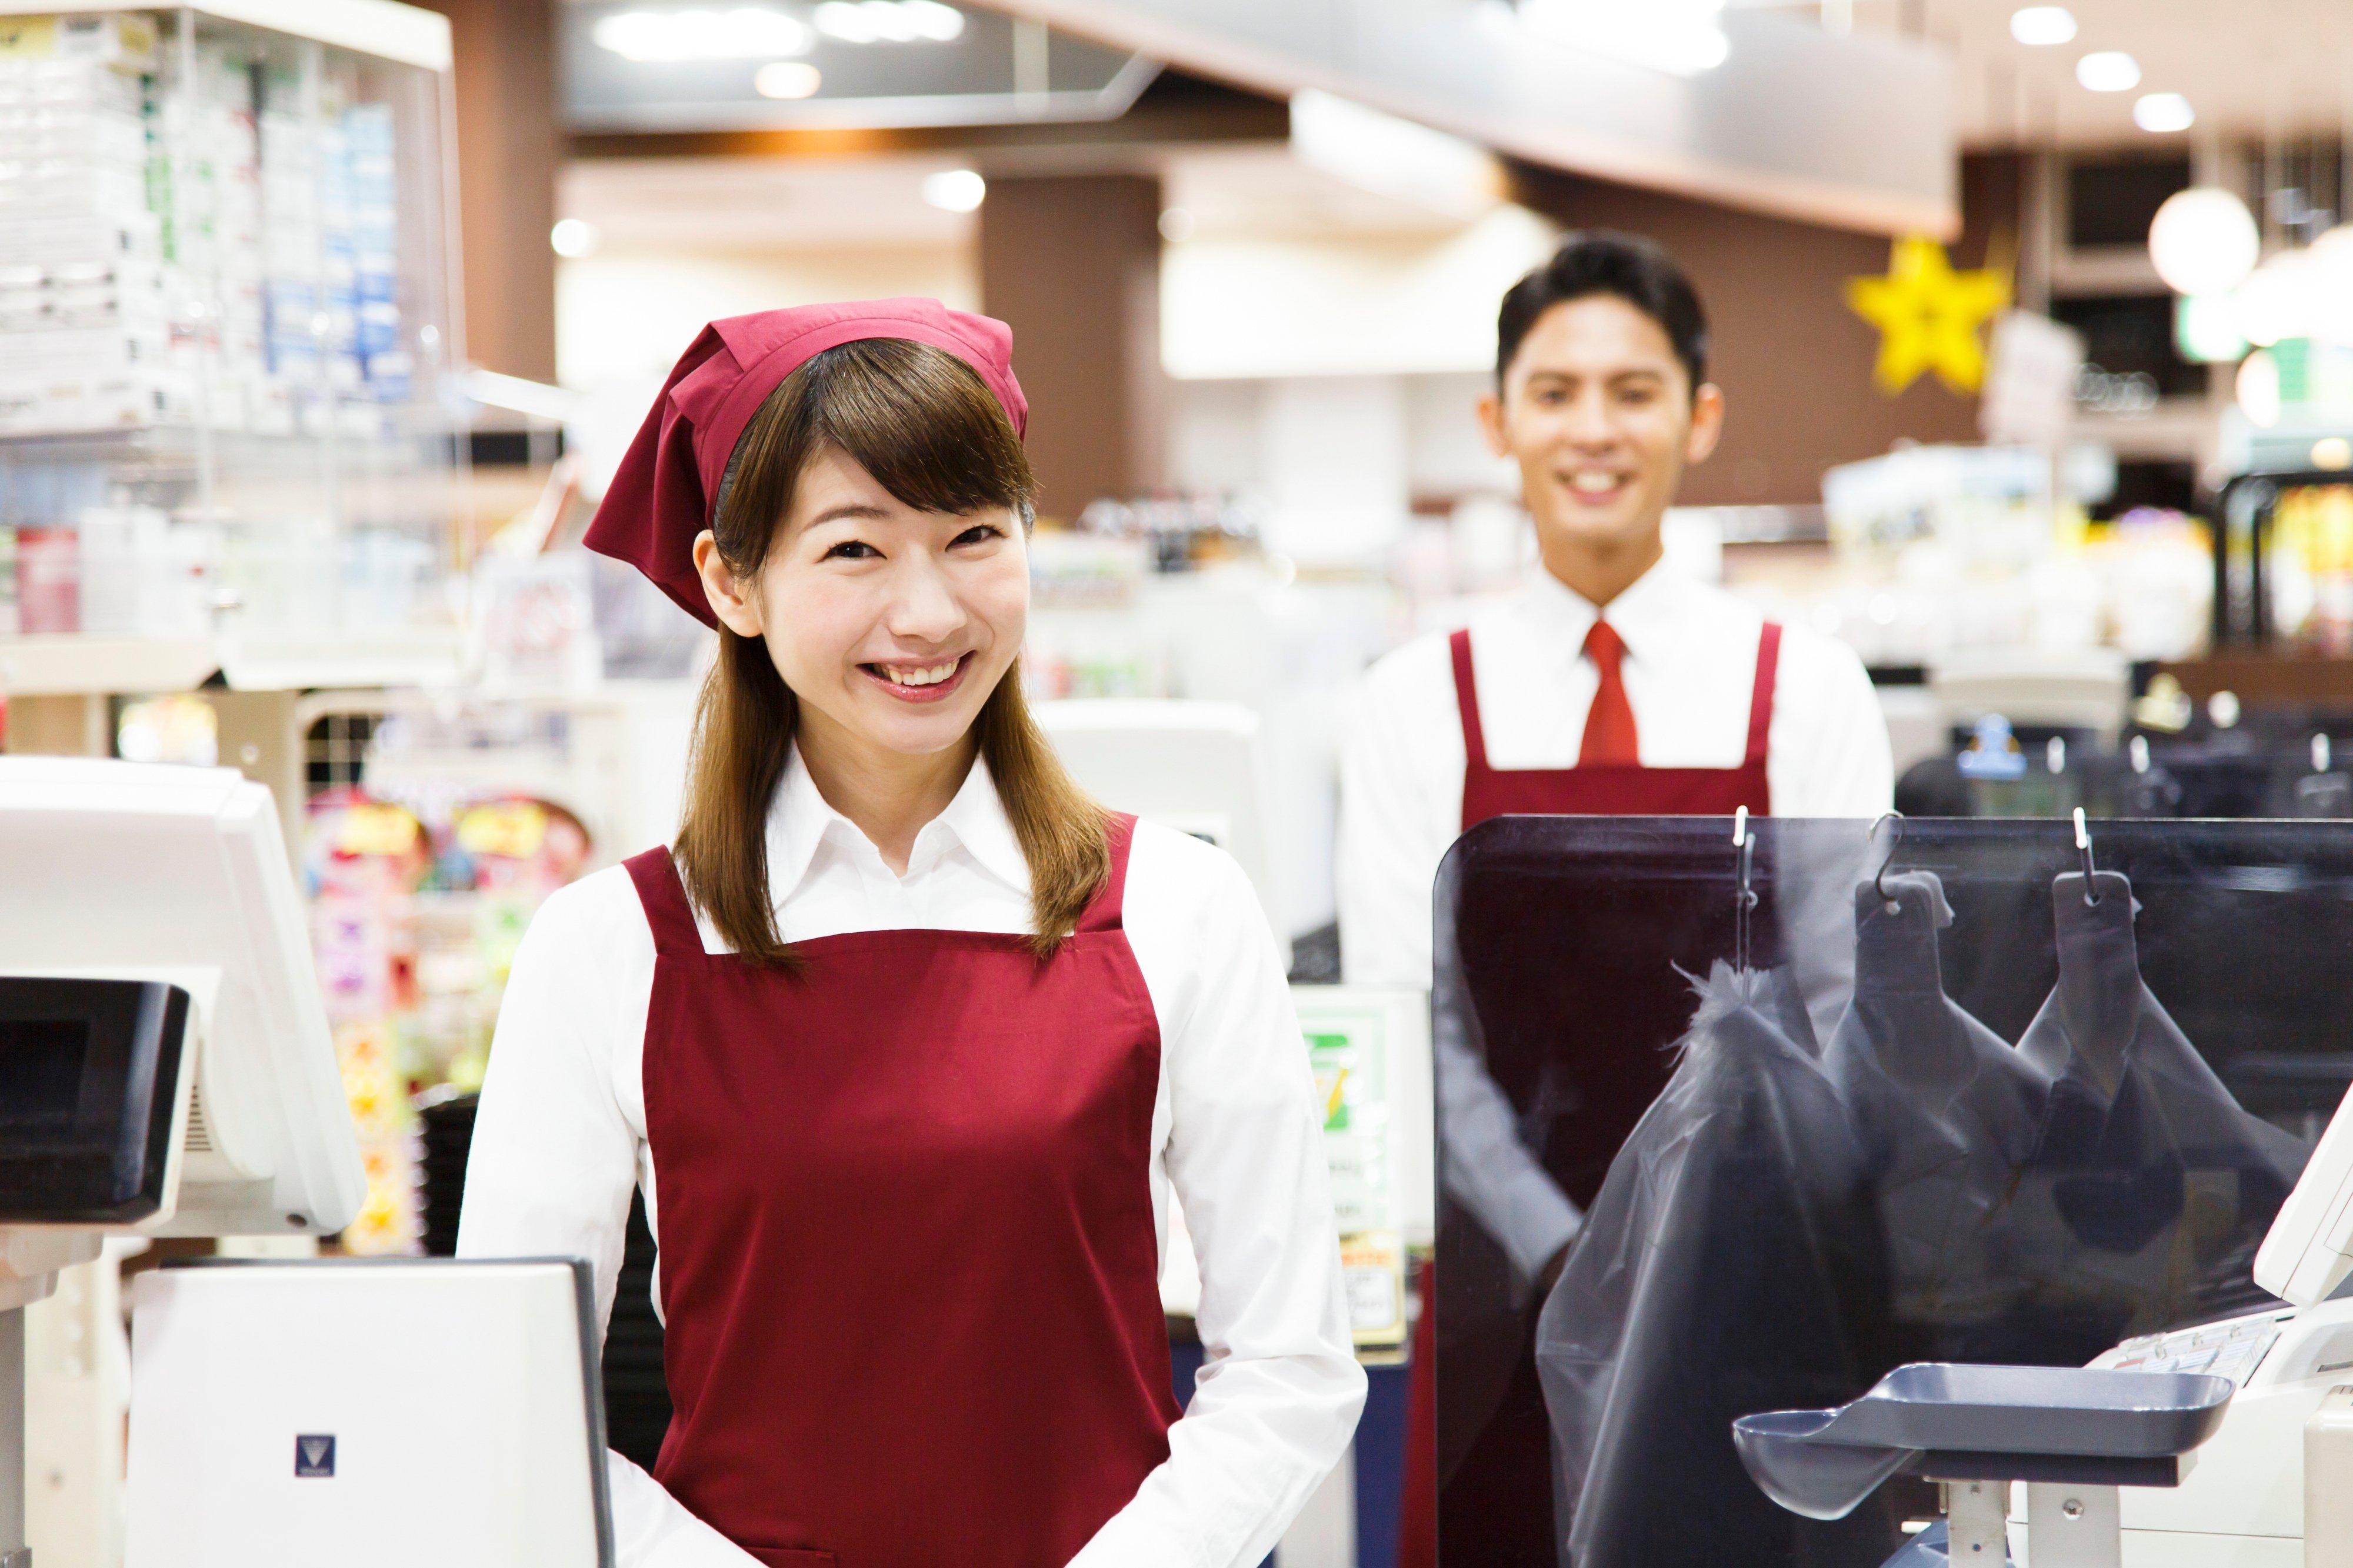 shift-management-of-cashier